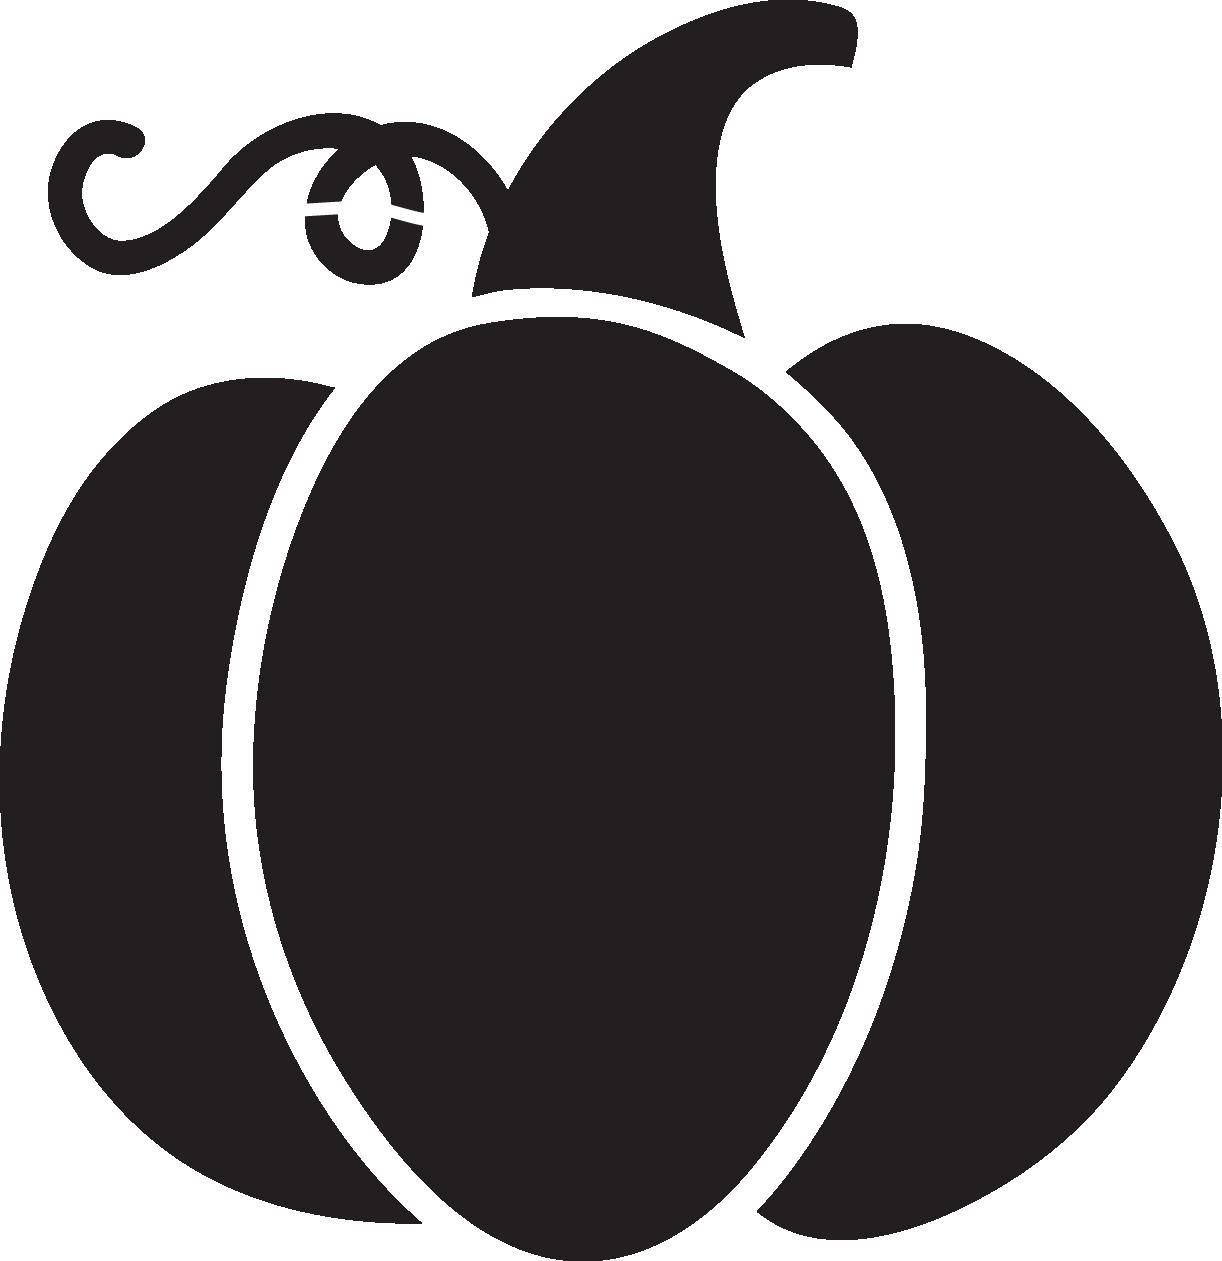 Longhorn clipart pumpkin. Silhouette at getdrawings com